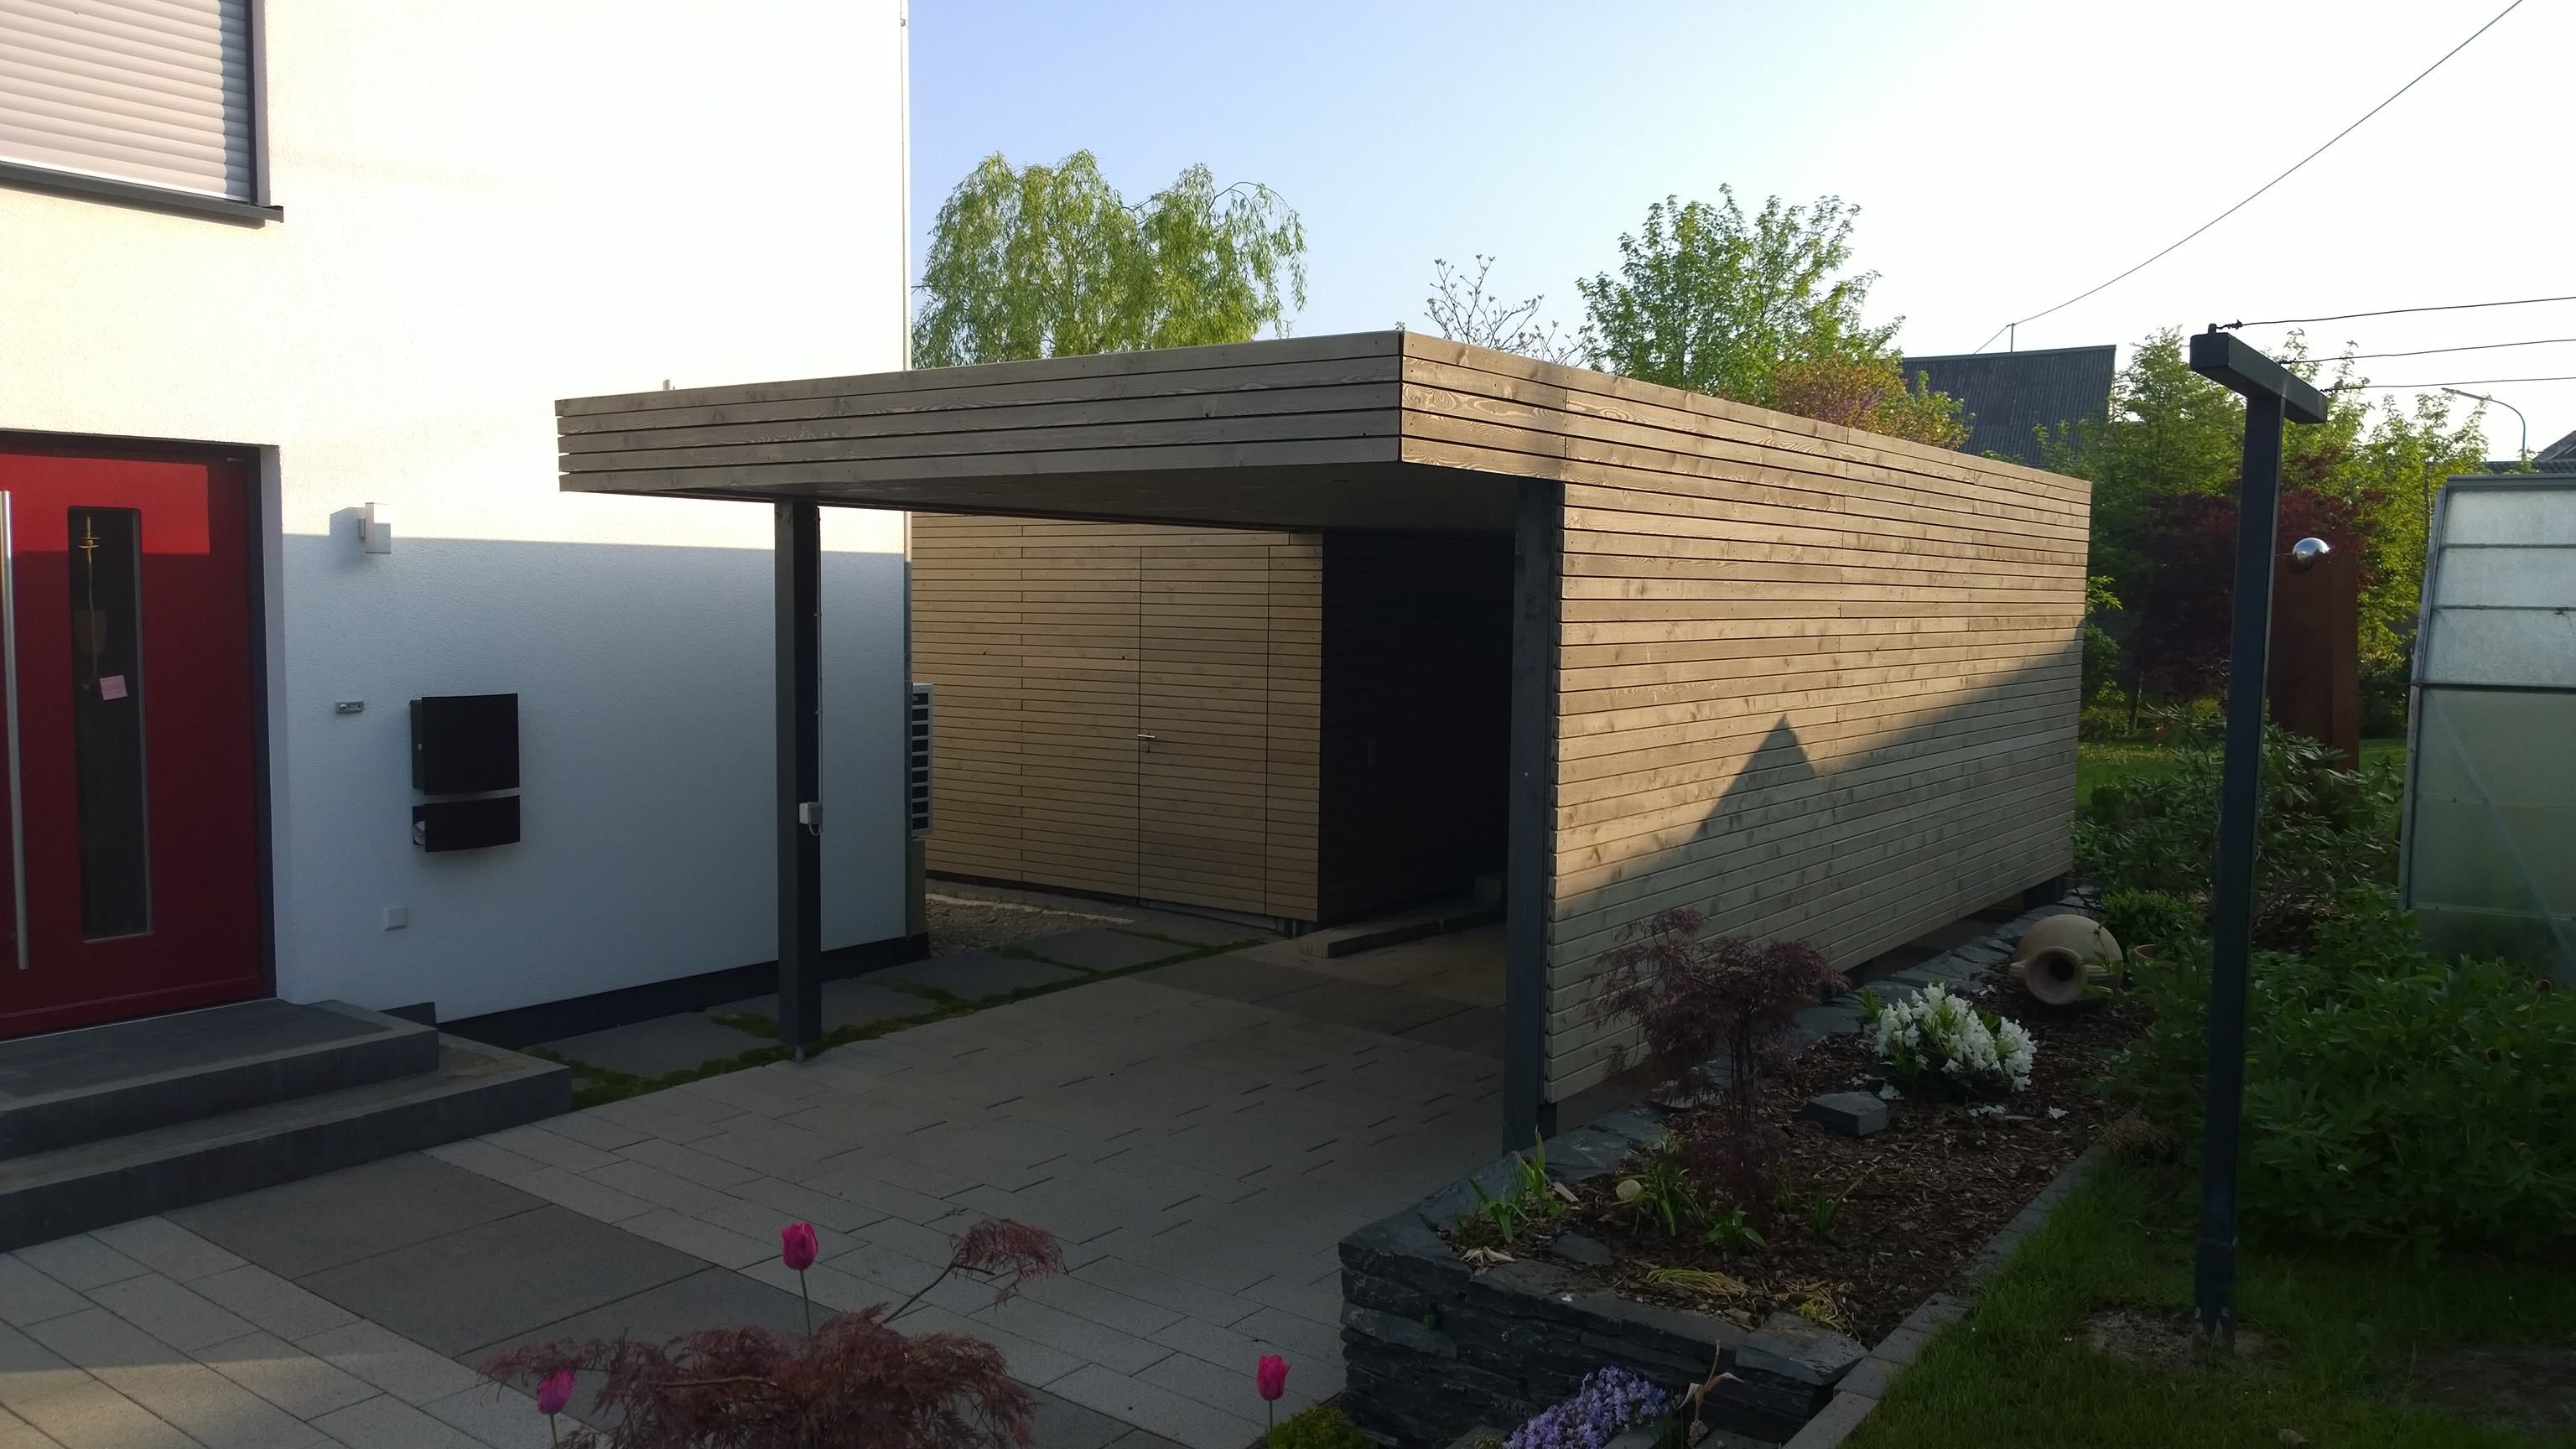 carport l rche carport 2017 carport pinterest sichtschutz garten carport und carport holz. Black Bedroom Furniture Sets. Home Design Ideas